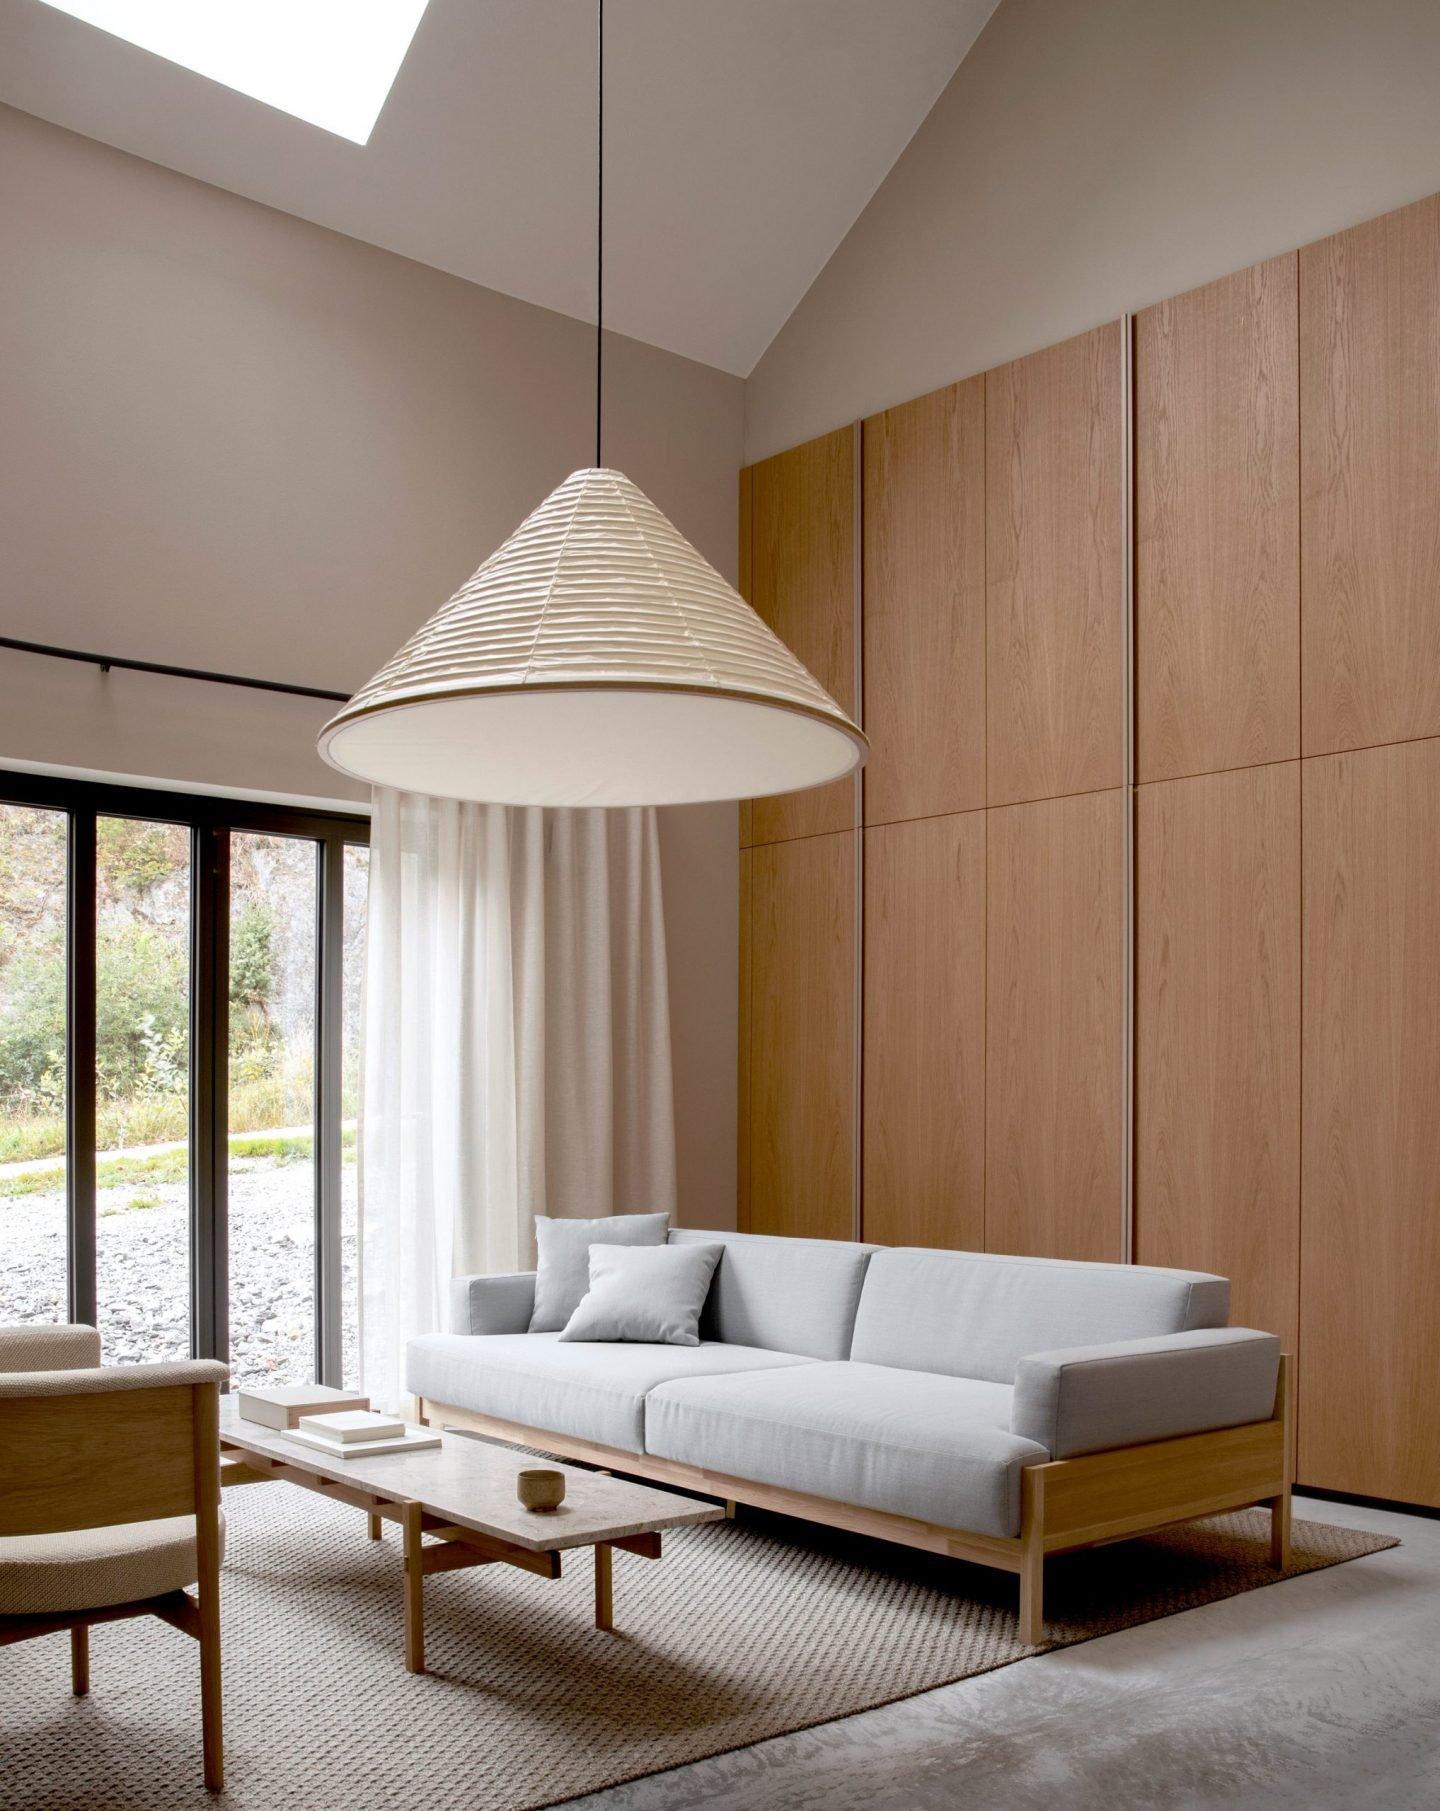 IGNANT-Architecture-Norm-Architects-Archipelago-House-08